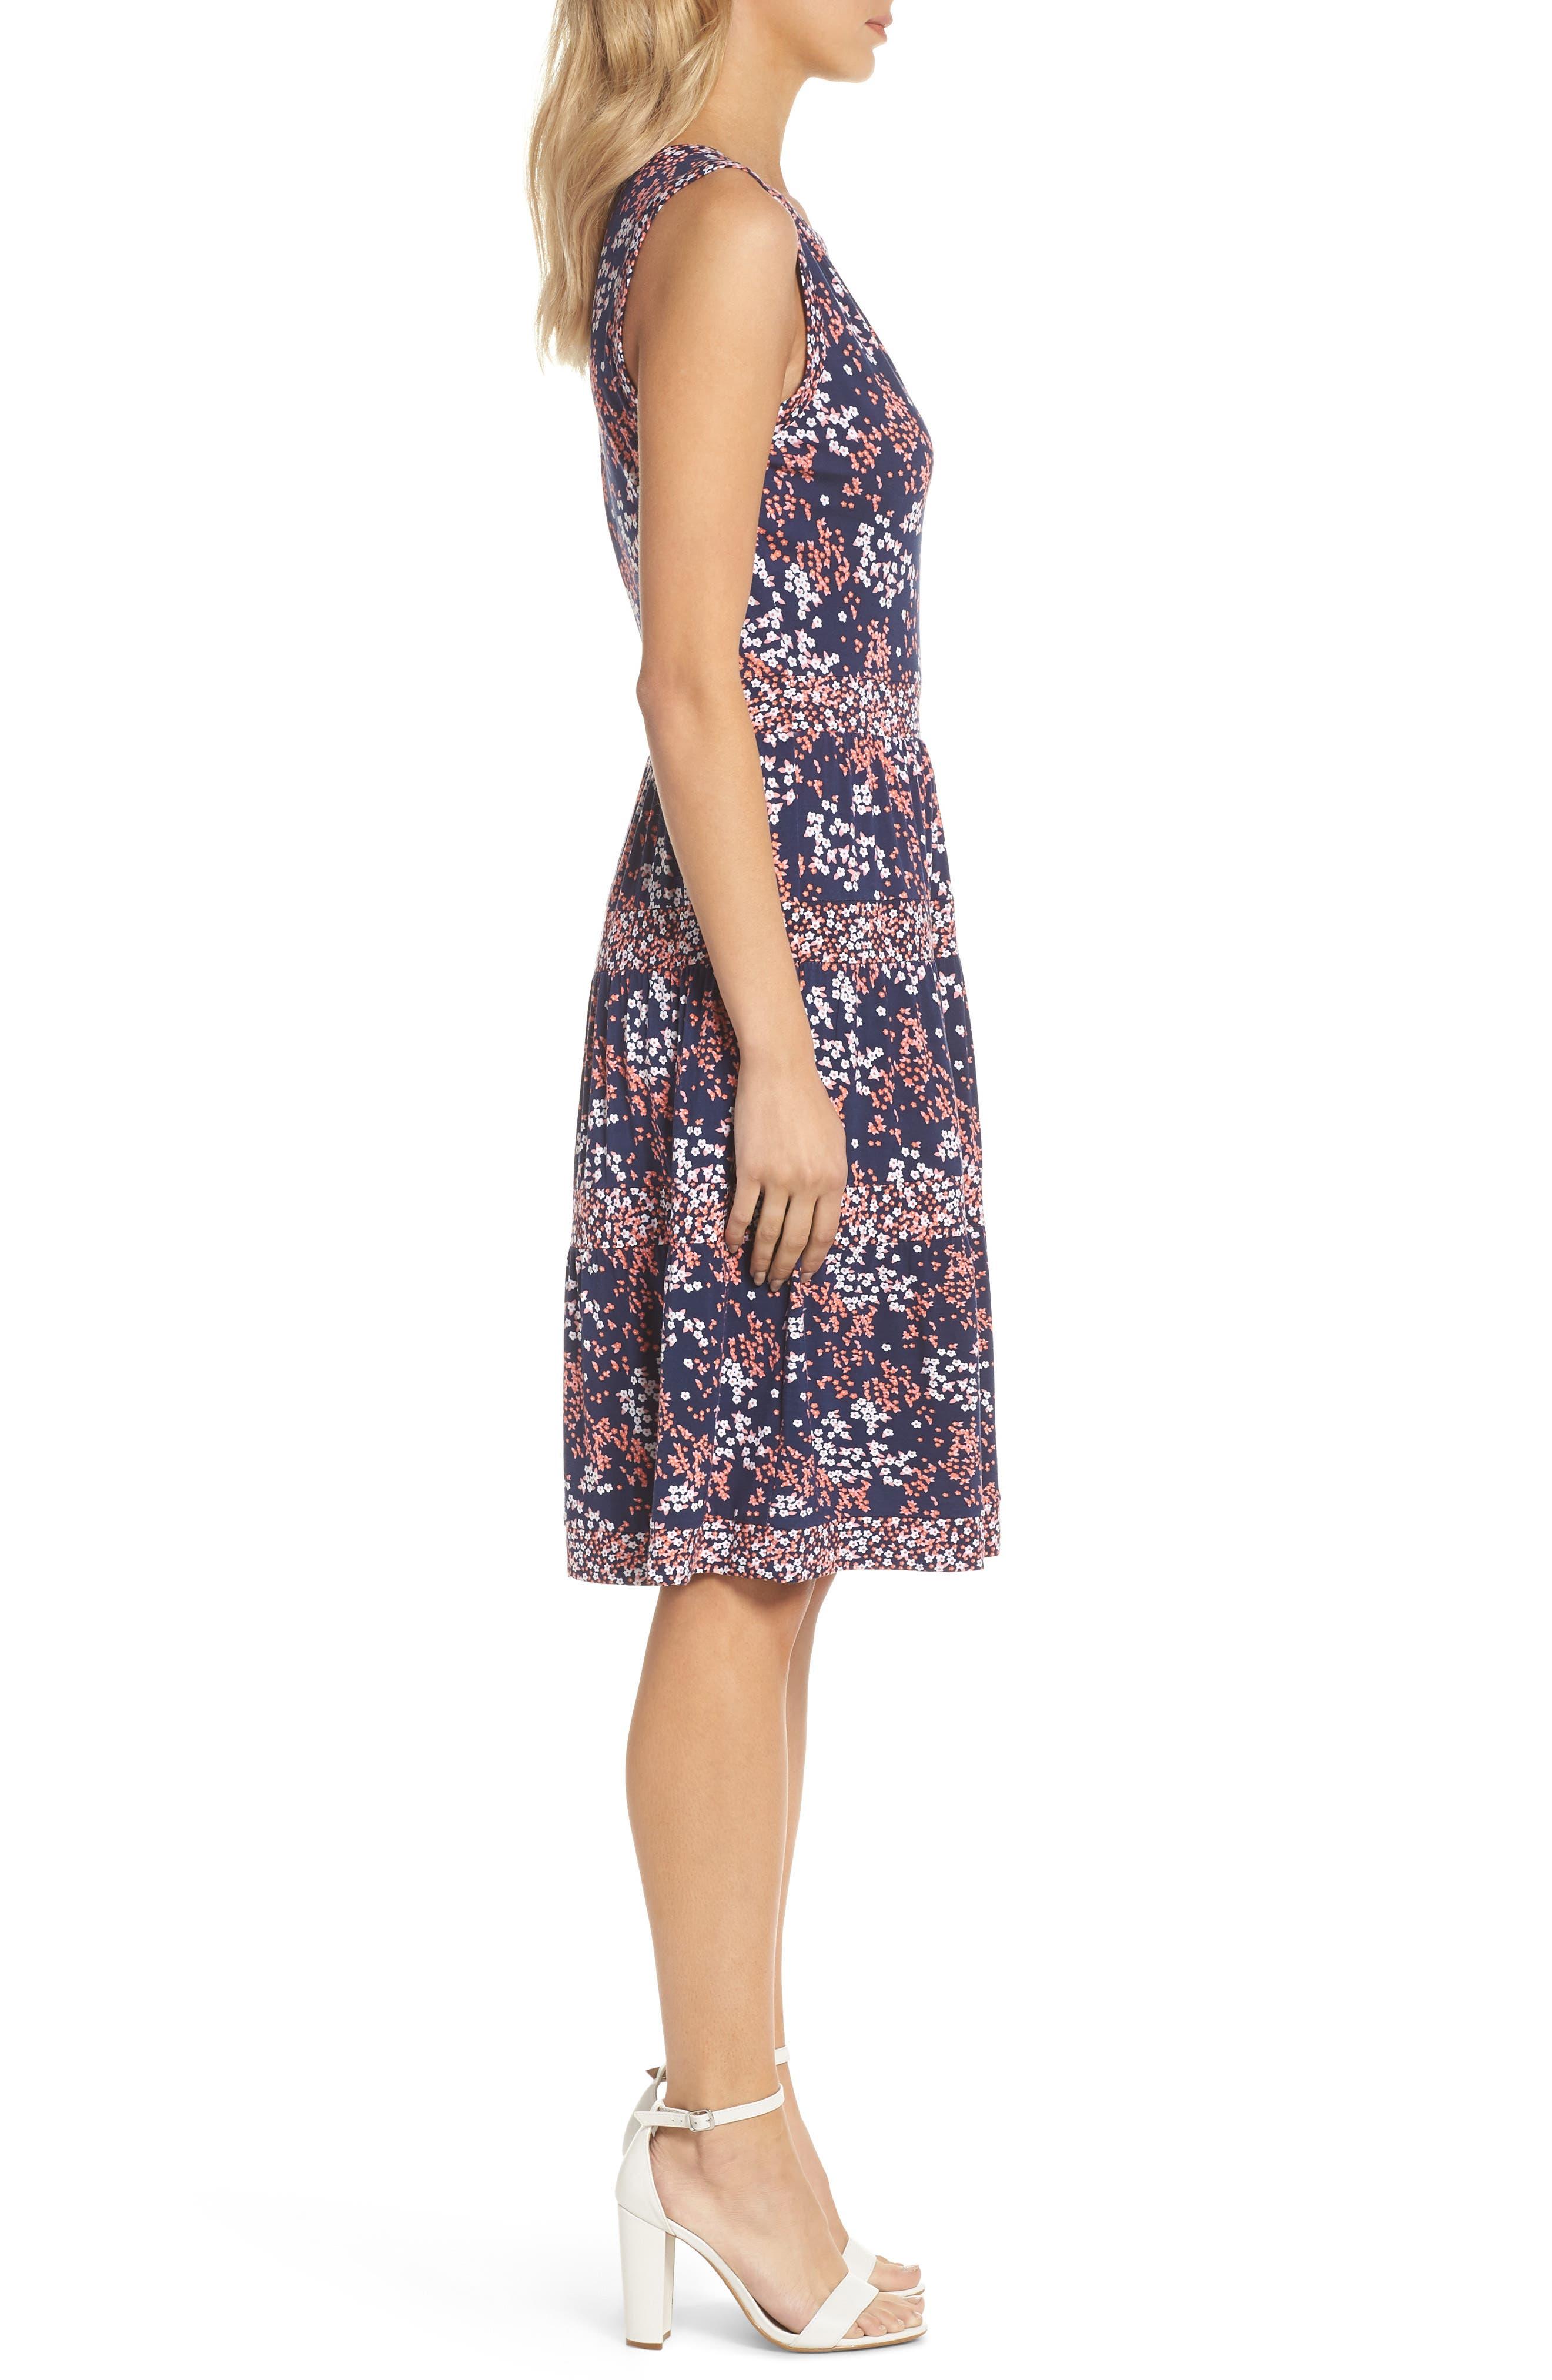 Blooms Border Tiered Dress,                             Alternate thumbnail 3, color,                             True Navy/ Bright Blush